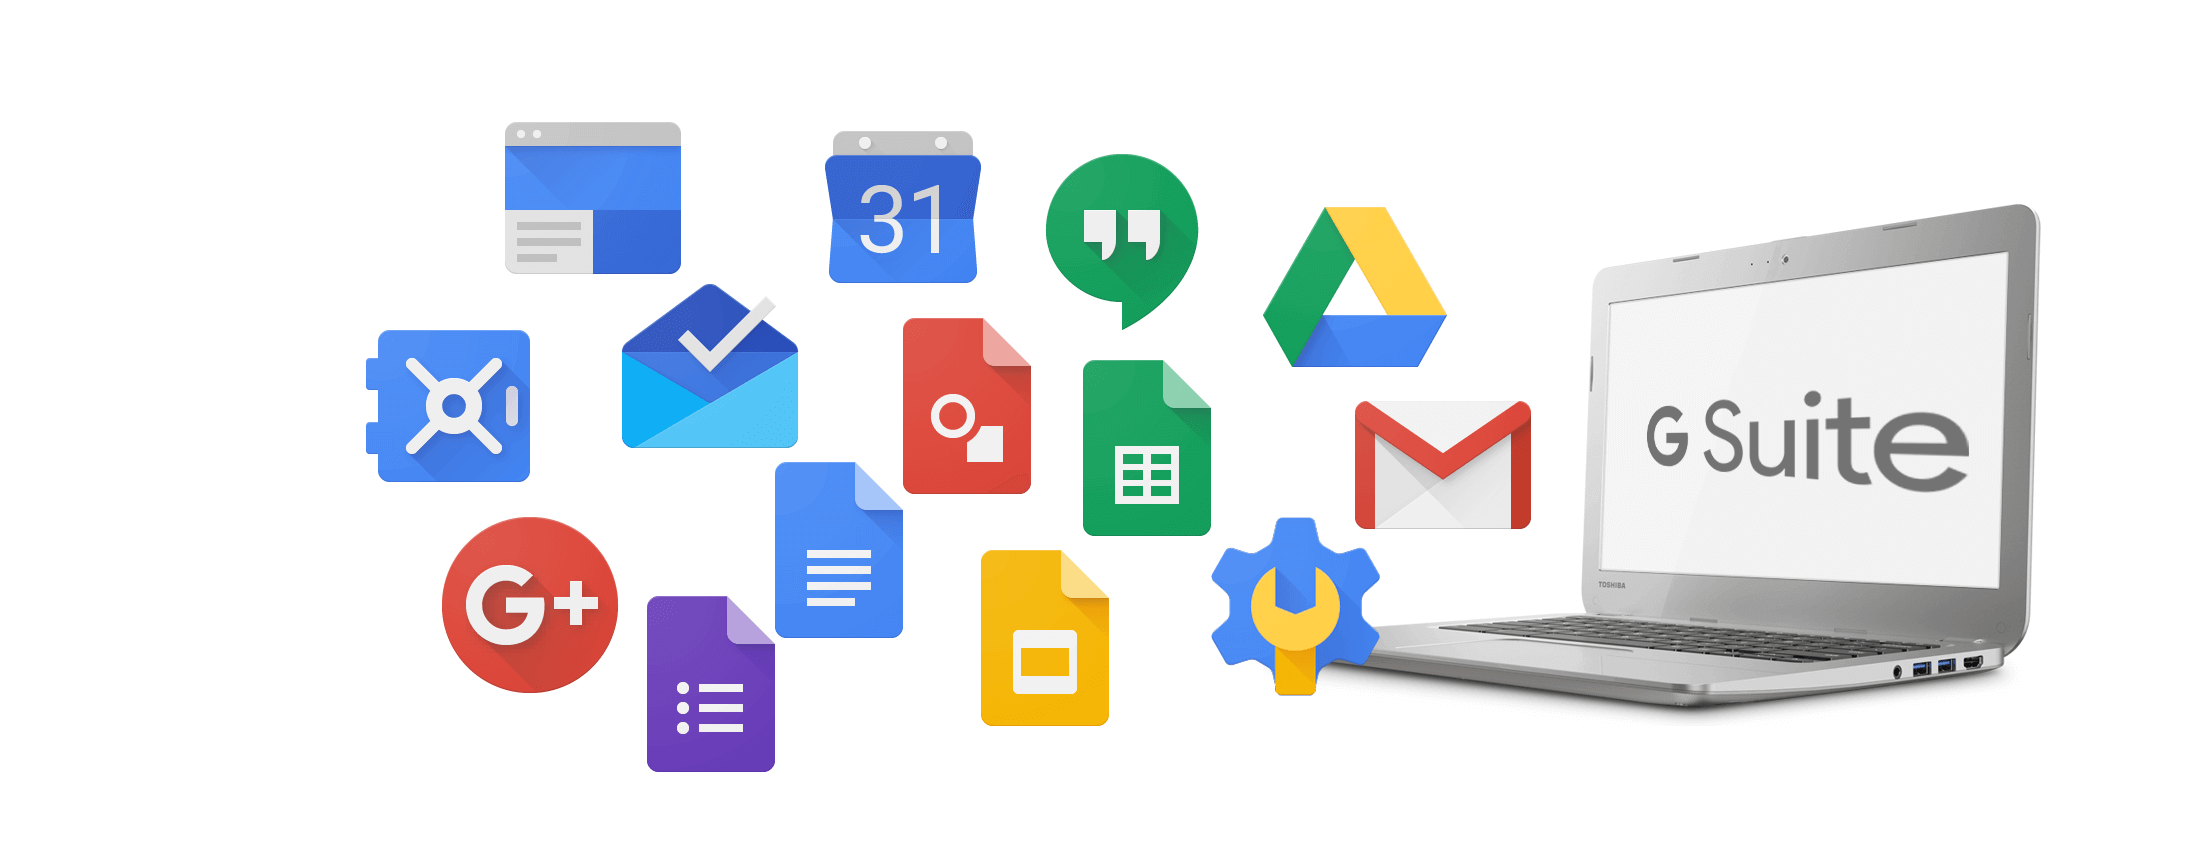 Smartworking google